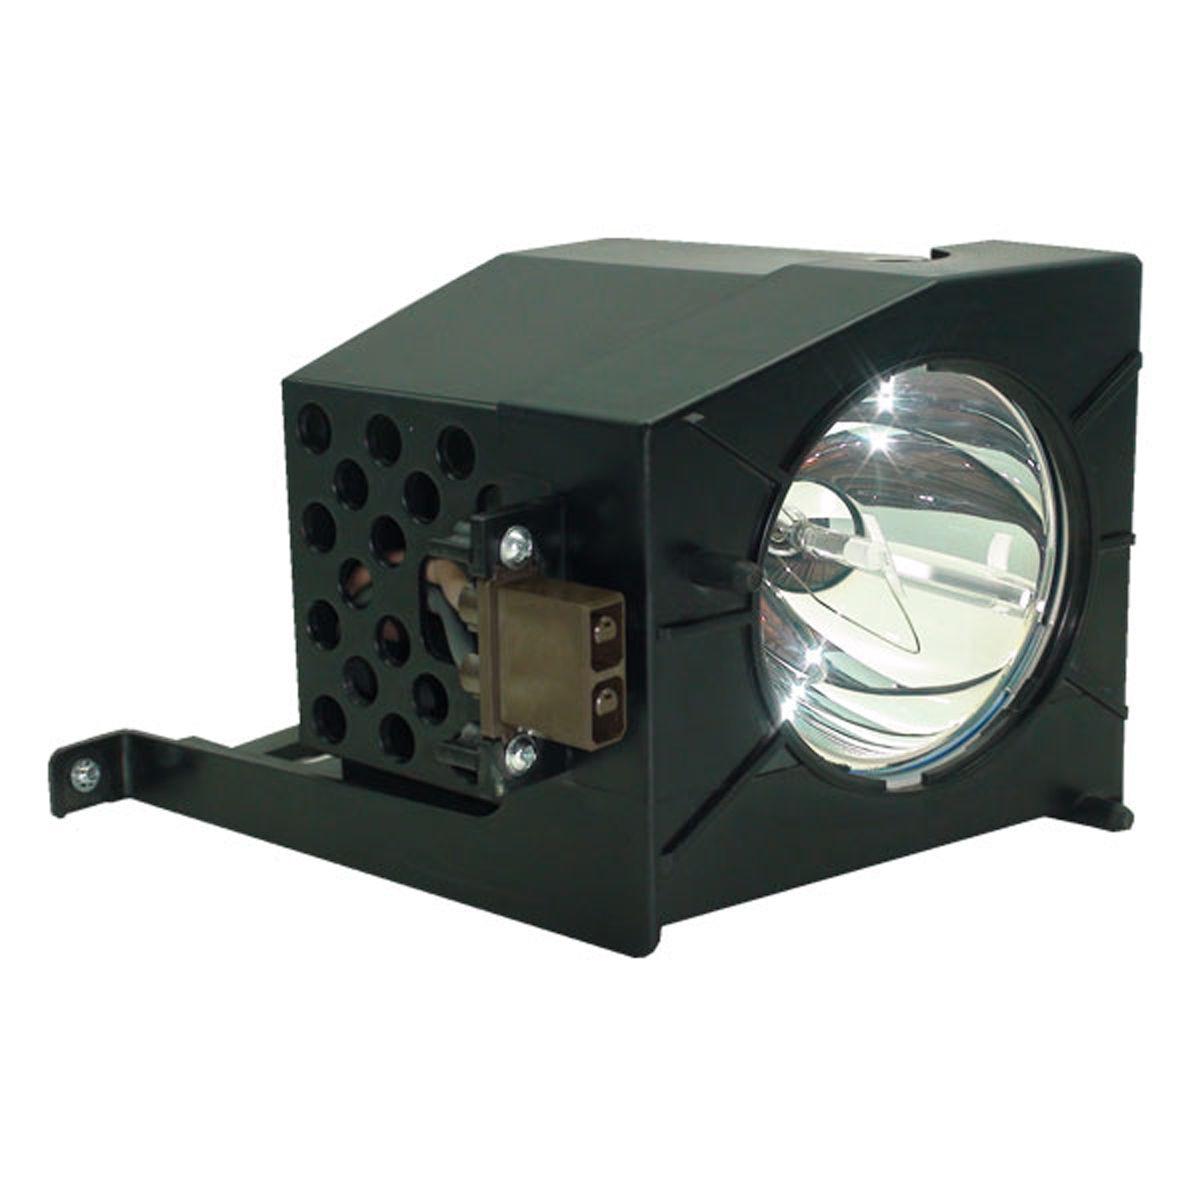 D95-LMP D95LMP 23311153 for Toshiba 52HM95 46HM15 Projector Bulb Lamp with housing replacement compatible dlp tv projector bare bulb d95 lmp 23311153 23311153a for toshiba 52hm195 52hm95 52hmx85 ect